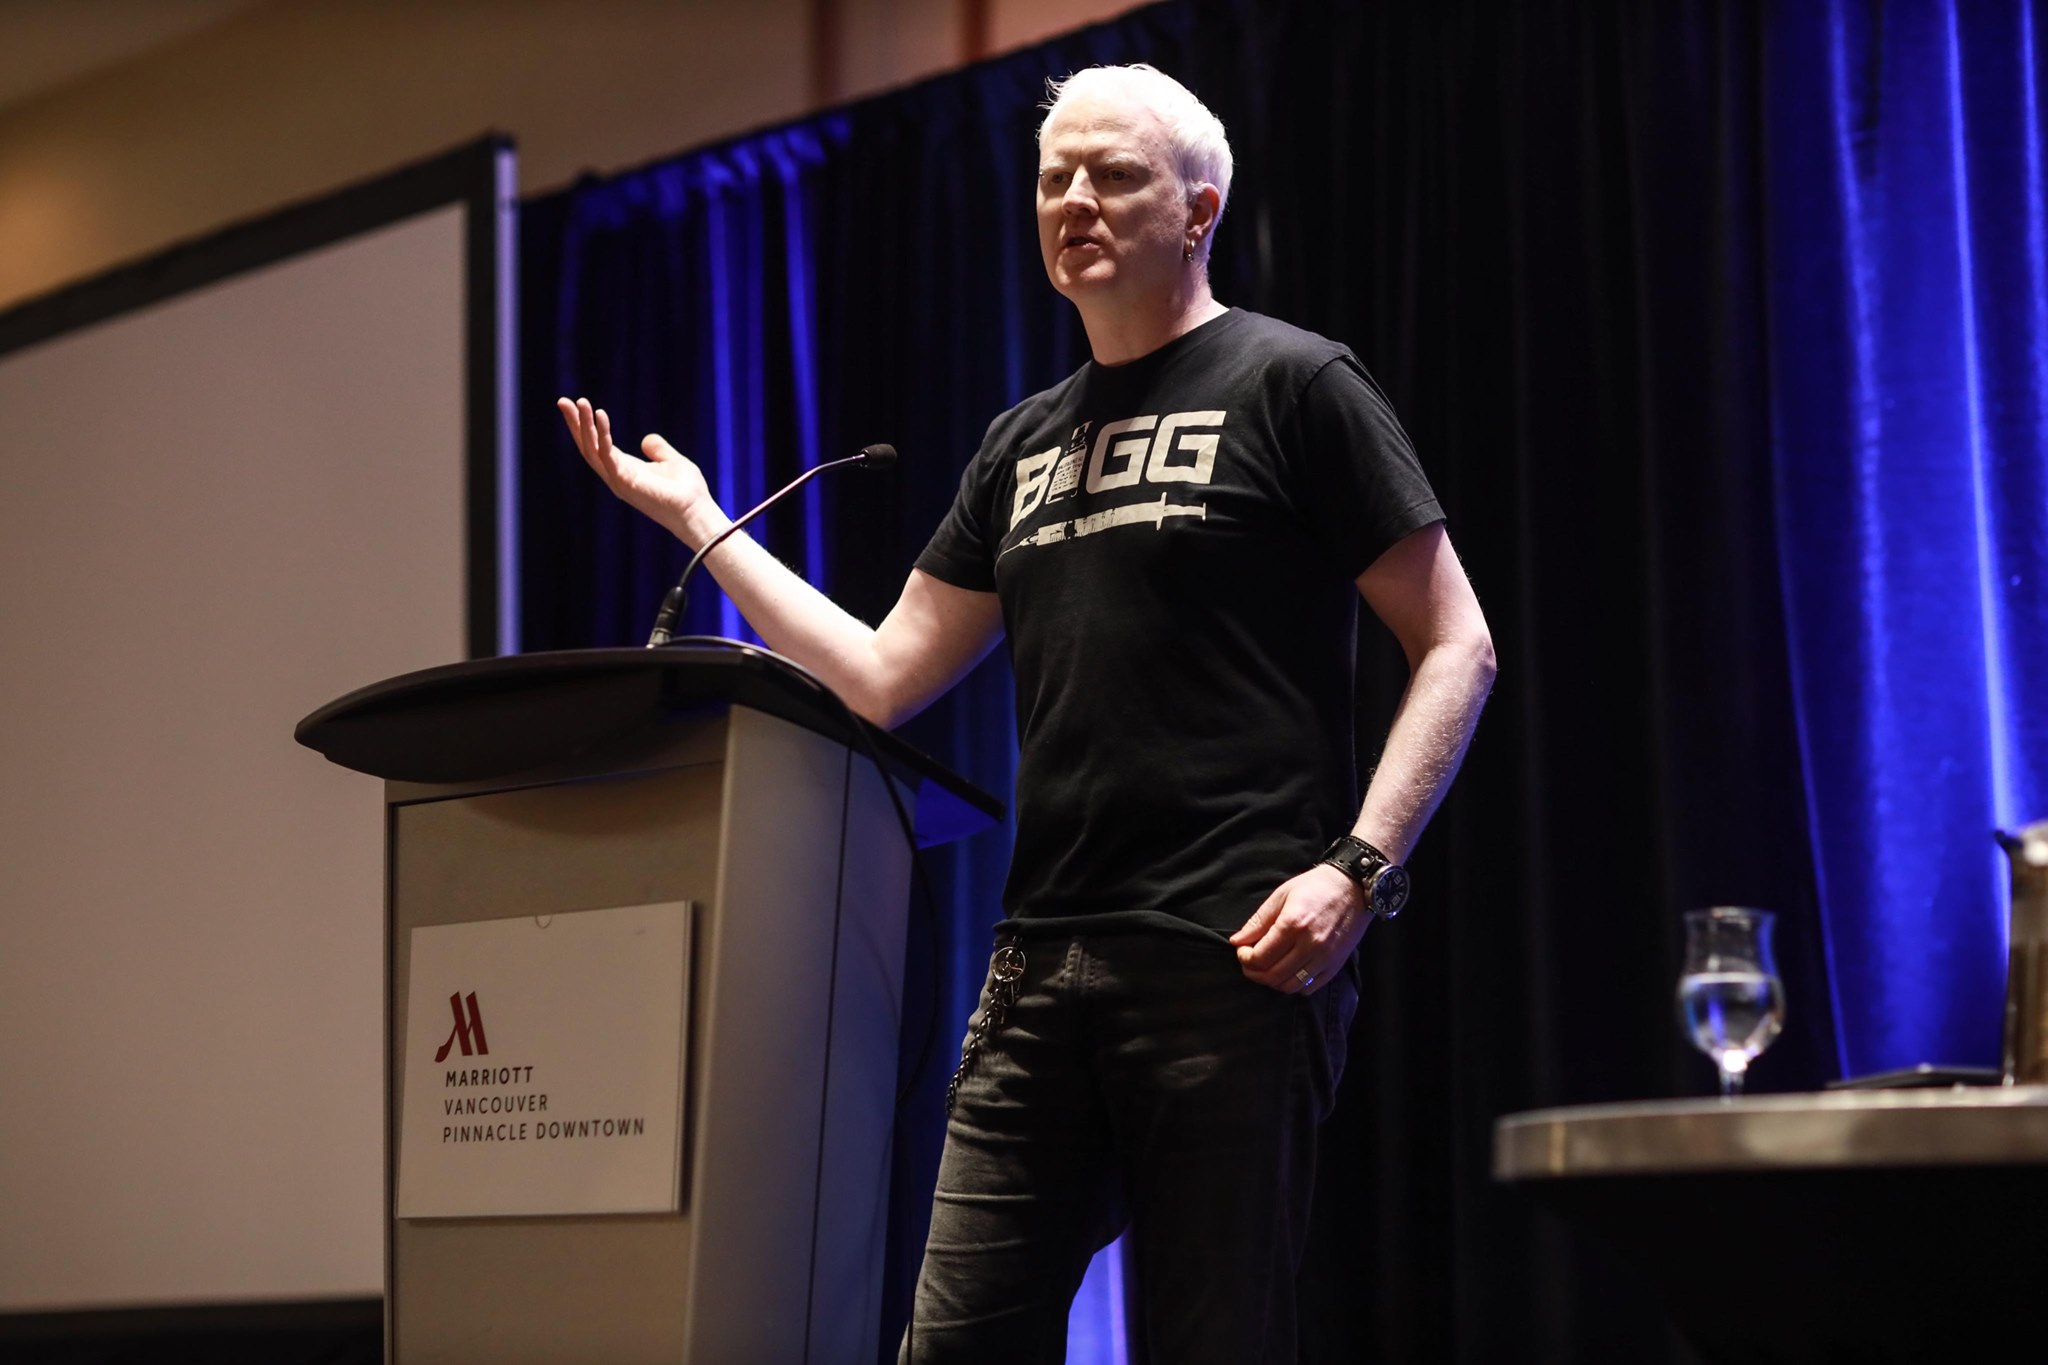 Garth Mullins, host of Crackdown podcast, was our January 9 keynote speaker.